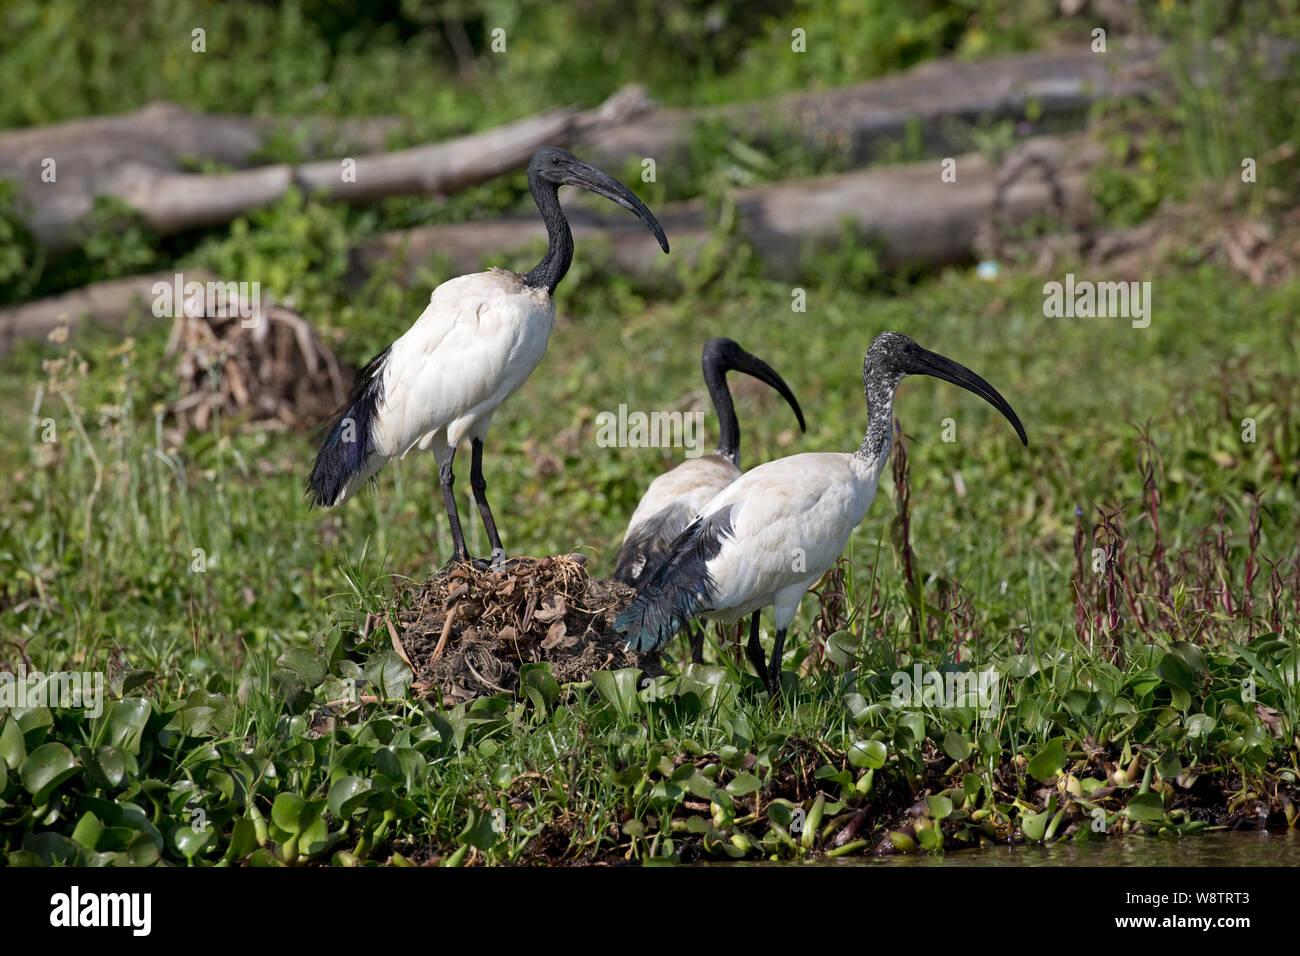 Sacred ibis, Threskiornis aethiopicus, standing at lake edge, Lake Naivasha, Kenya Stock Photo